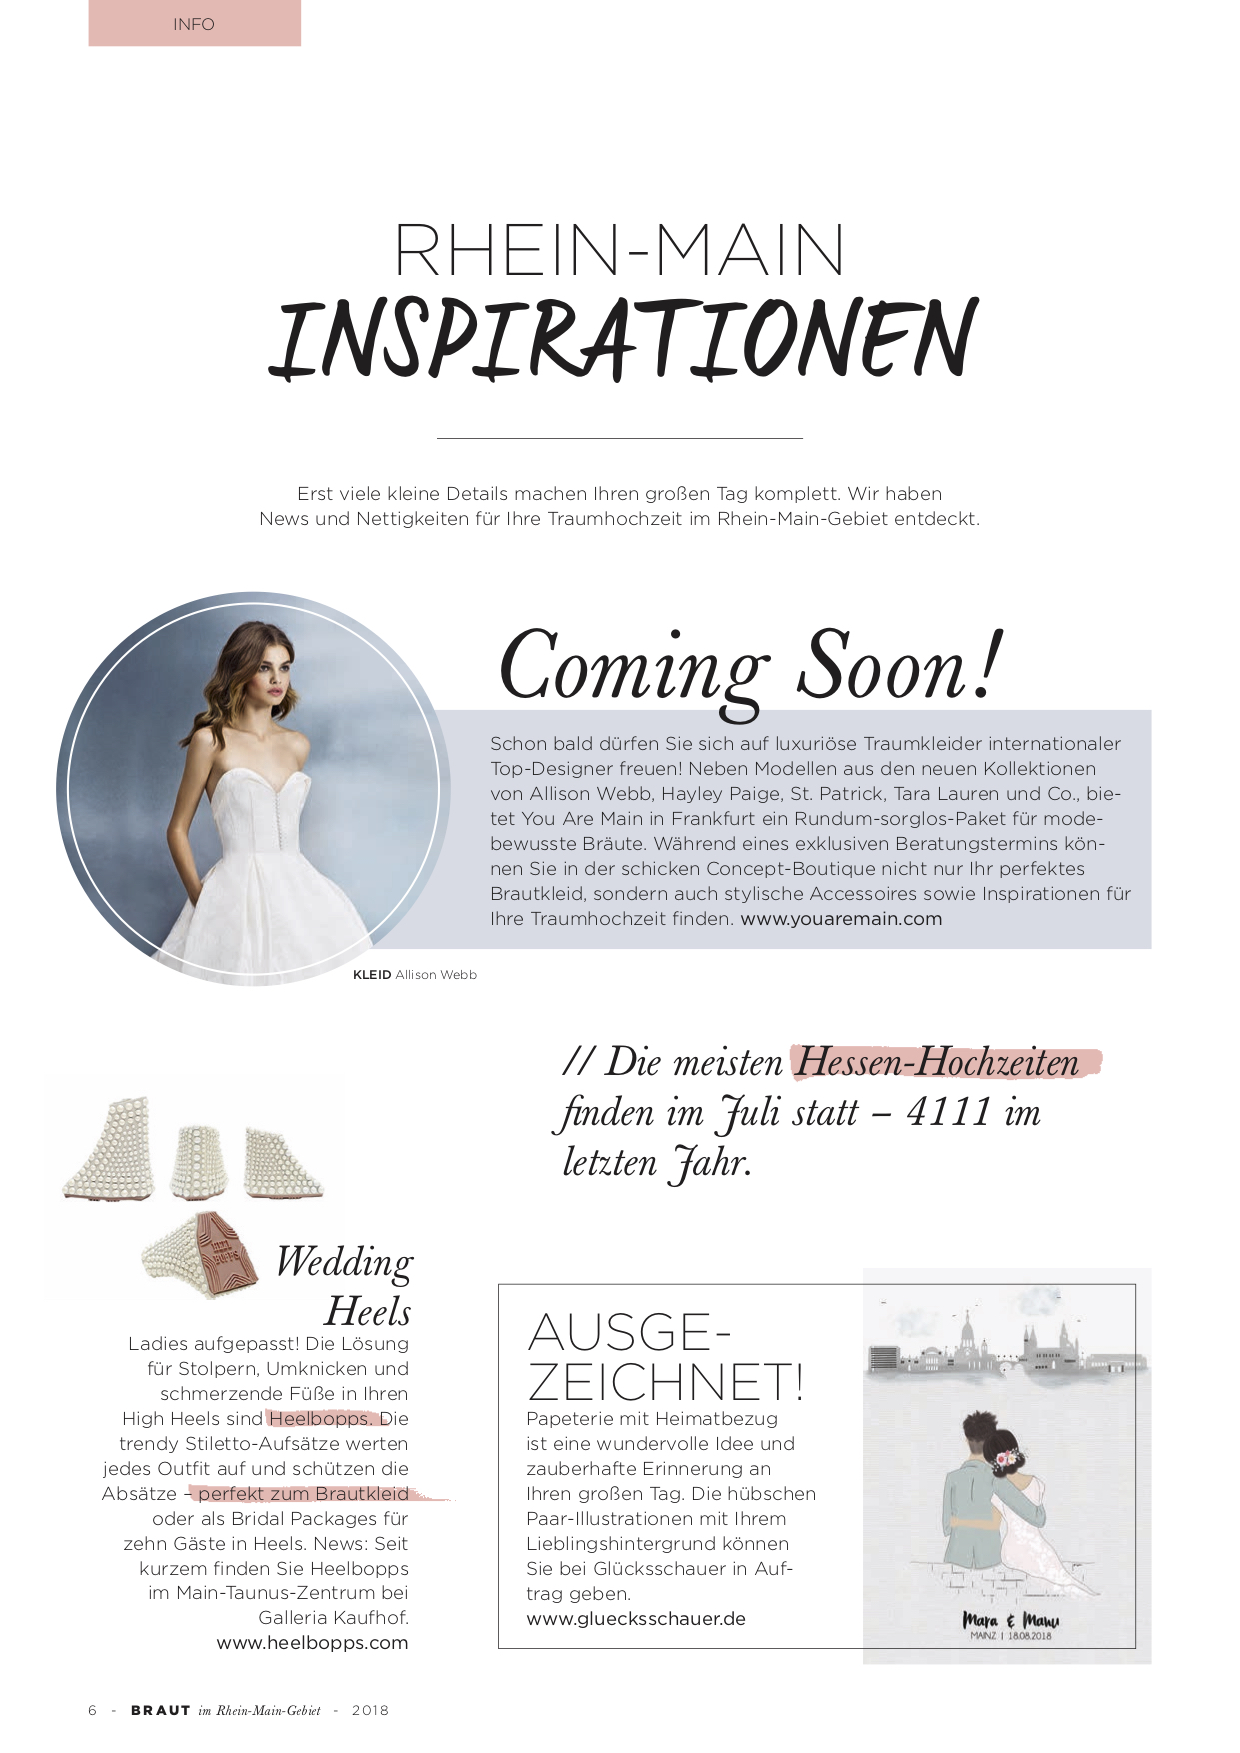 News Braut_im_RheinMainGebiet_2018.jpg